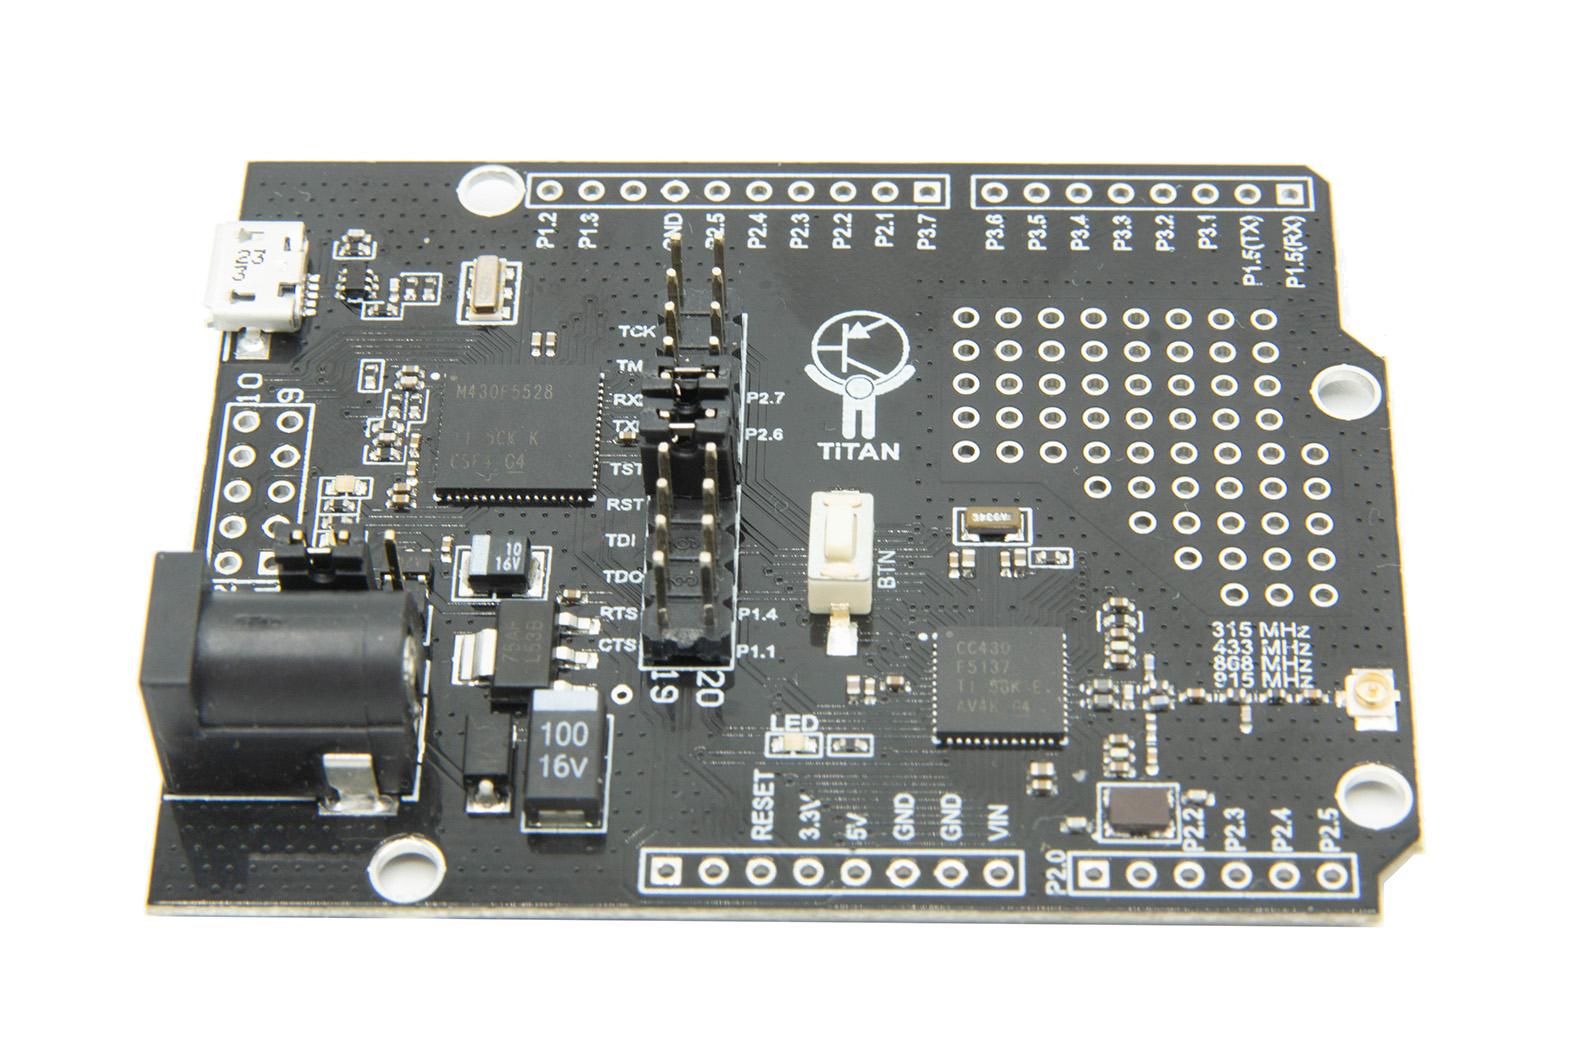 TiTAN development board based on CC430